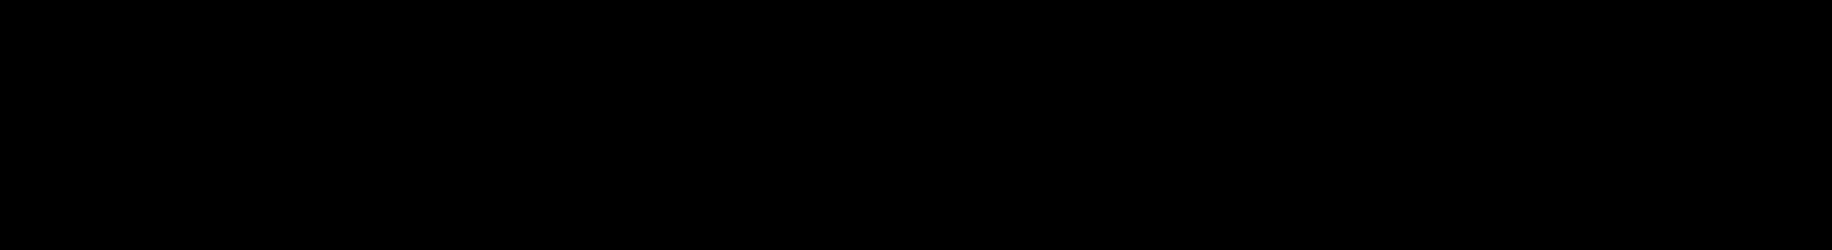 Distintivos